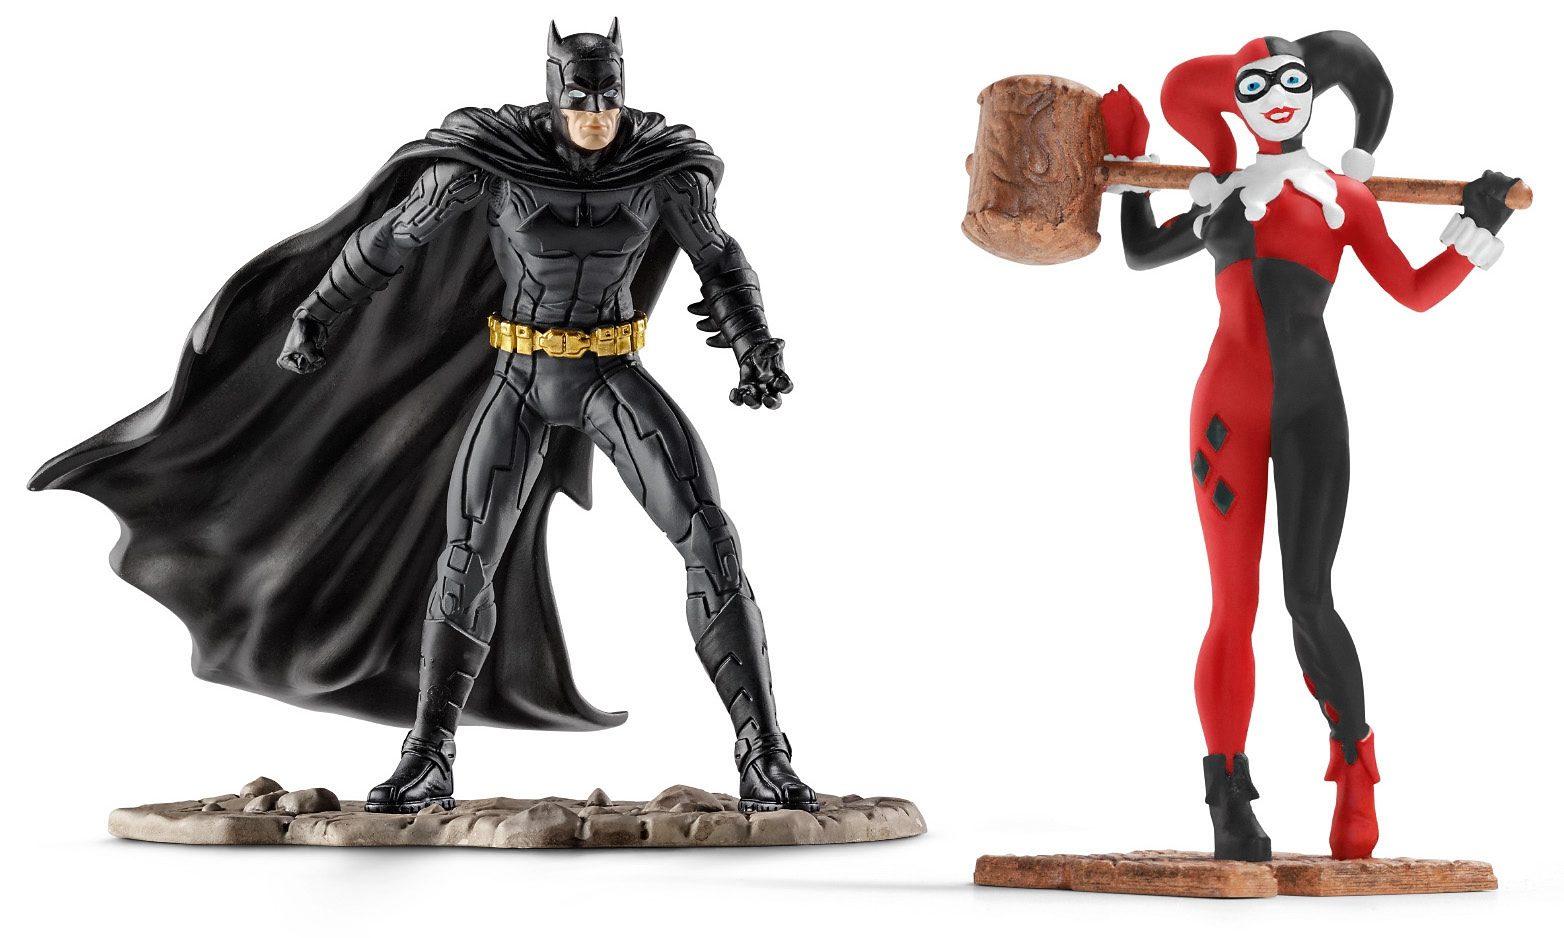 Schleich® Spielfigurenset, »DC Comics™ Justice League - Scenery Pack Batman vs Harley Quinn« (2tlg.)